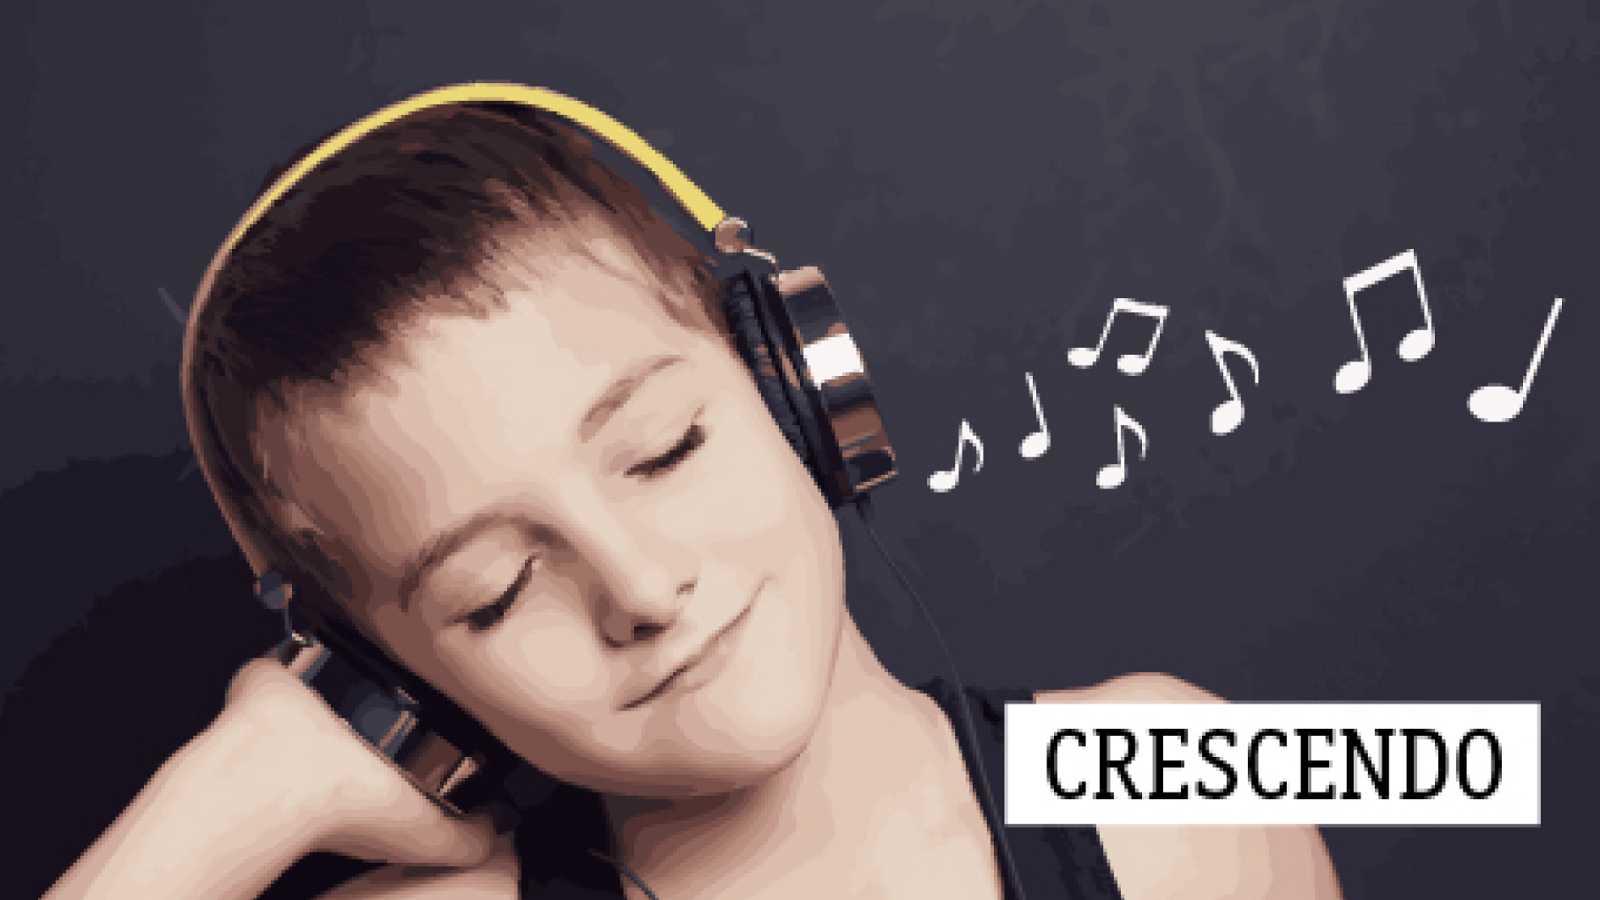 Crescendo - Mozart: La flauta mágica - 26/10/19 - escuchar ahora